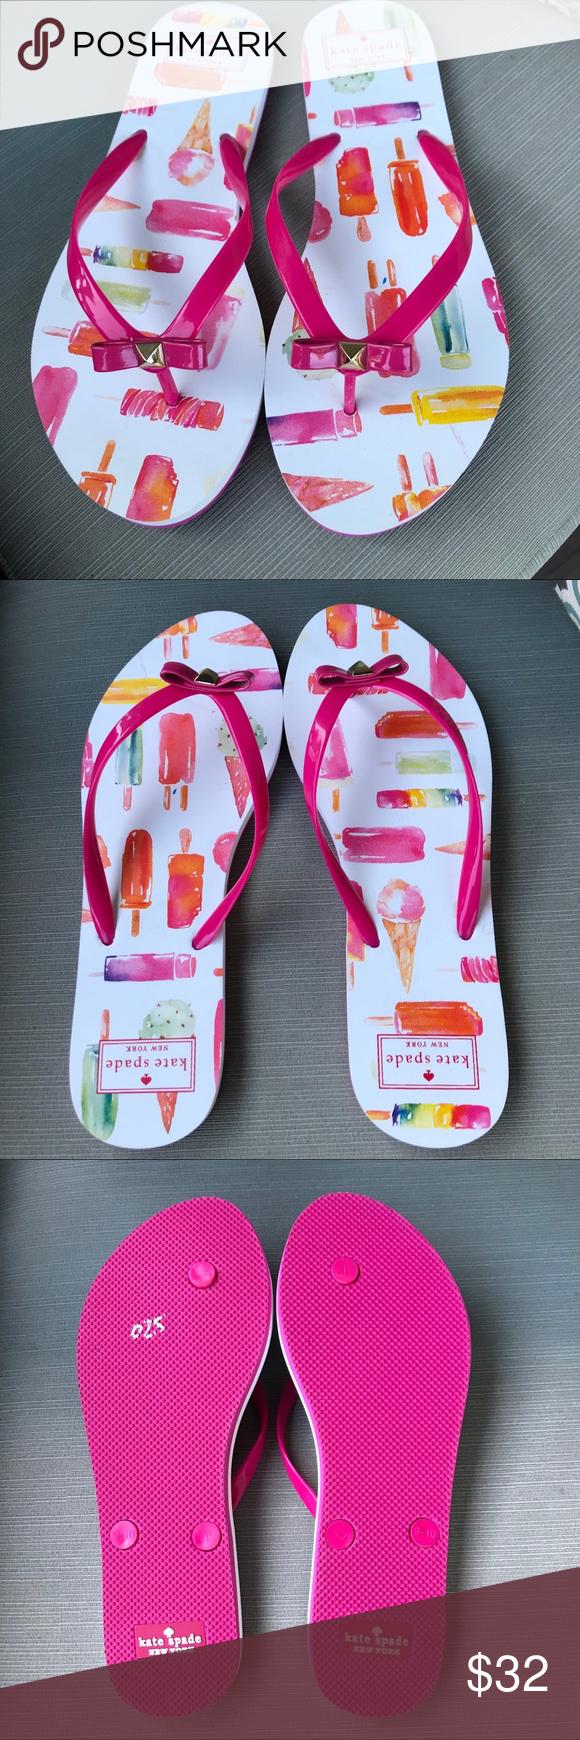 97a5731d87bb NEW Kate Spade Popsicle Print Flip Flops